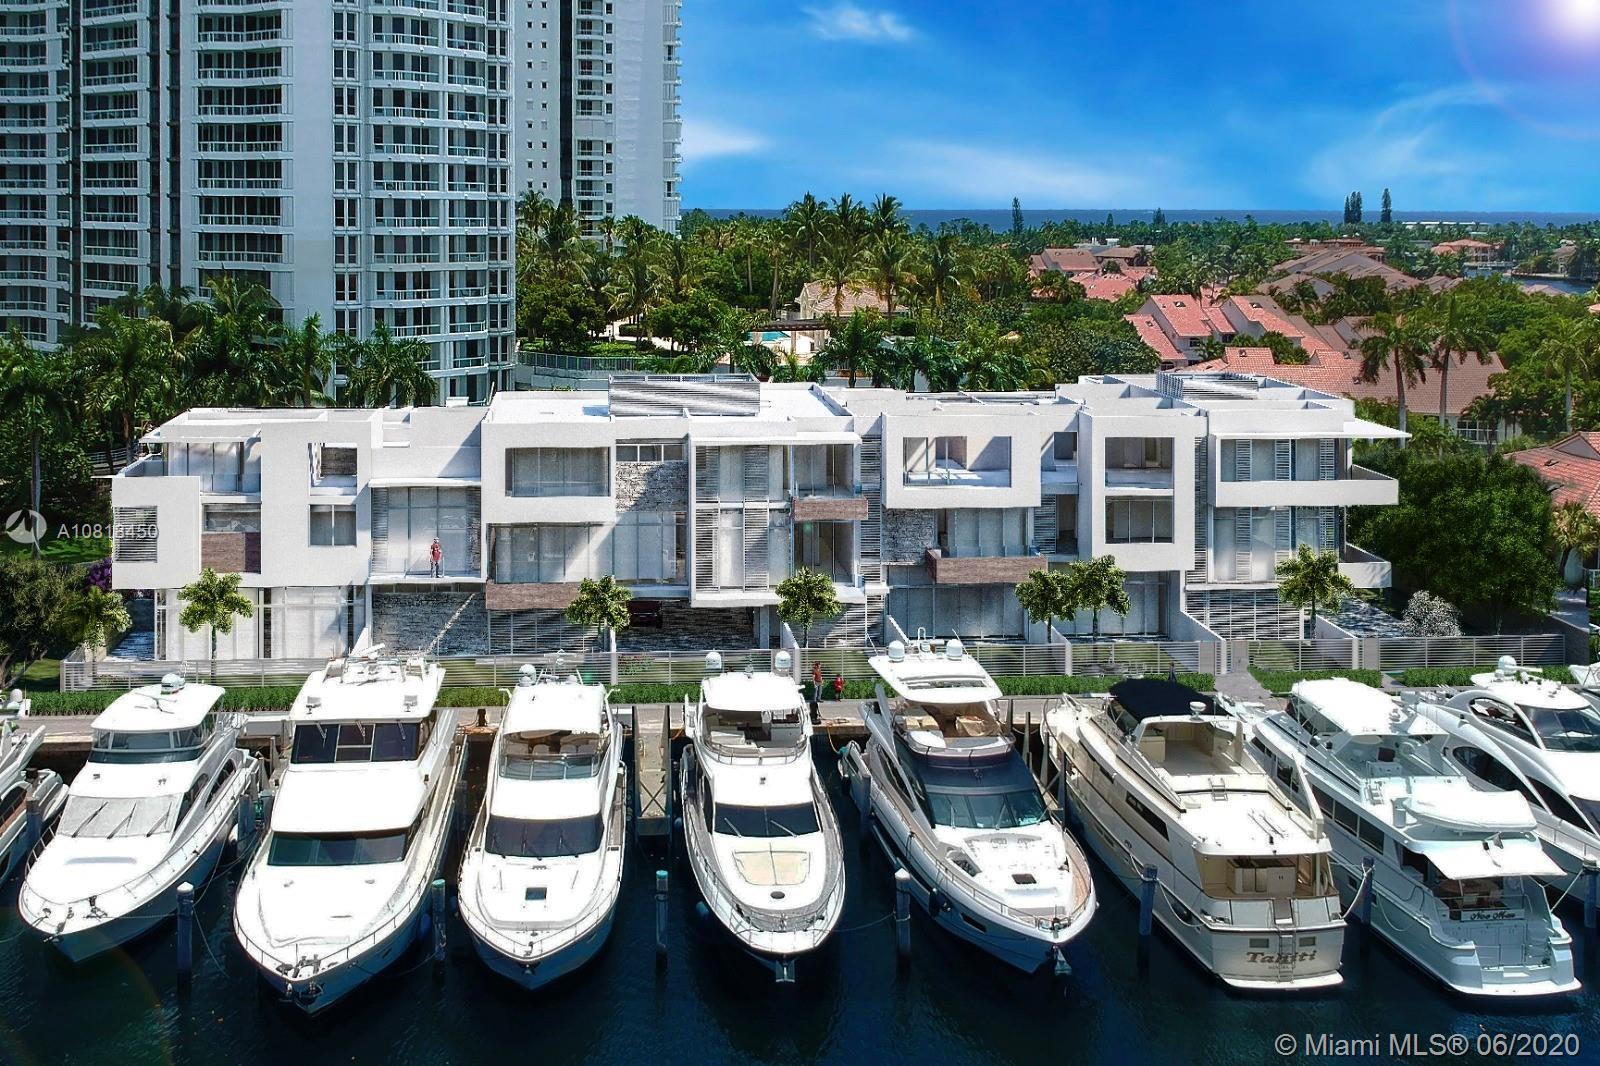 3750 Yacht Club Dr #2, Aventura, FL 33180 - Aventura, FL real estate listing